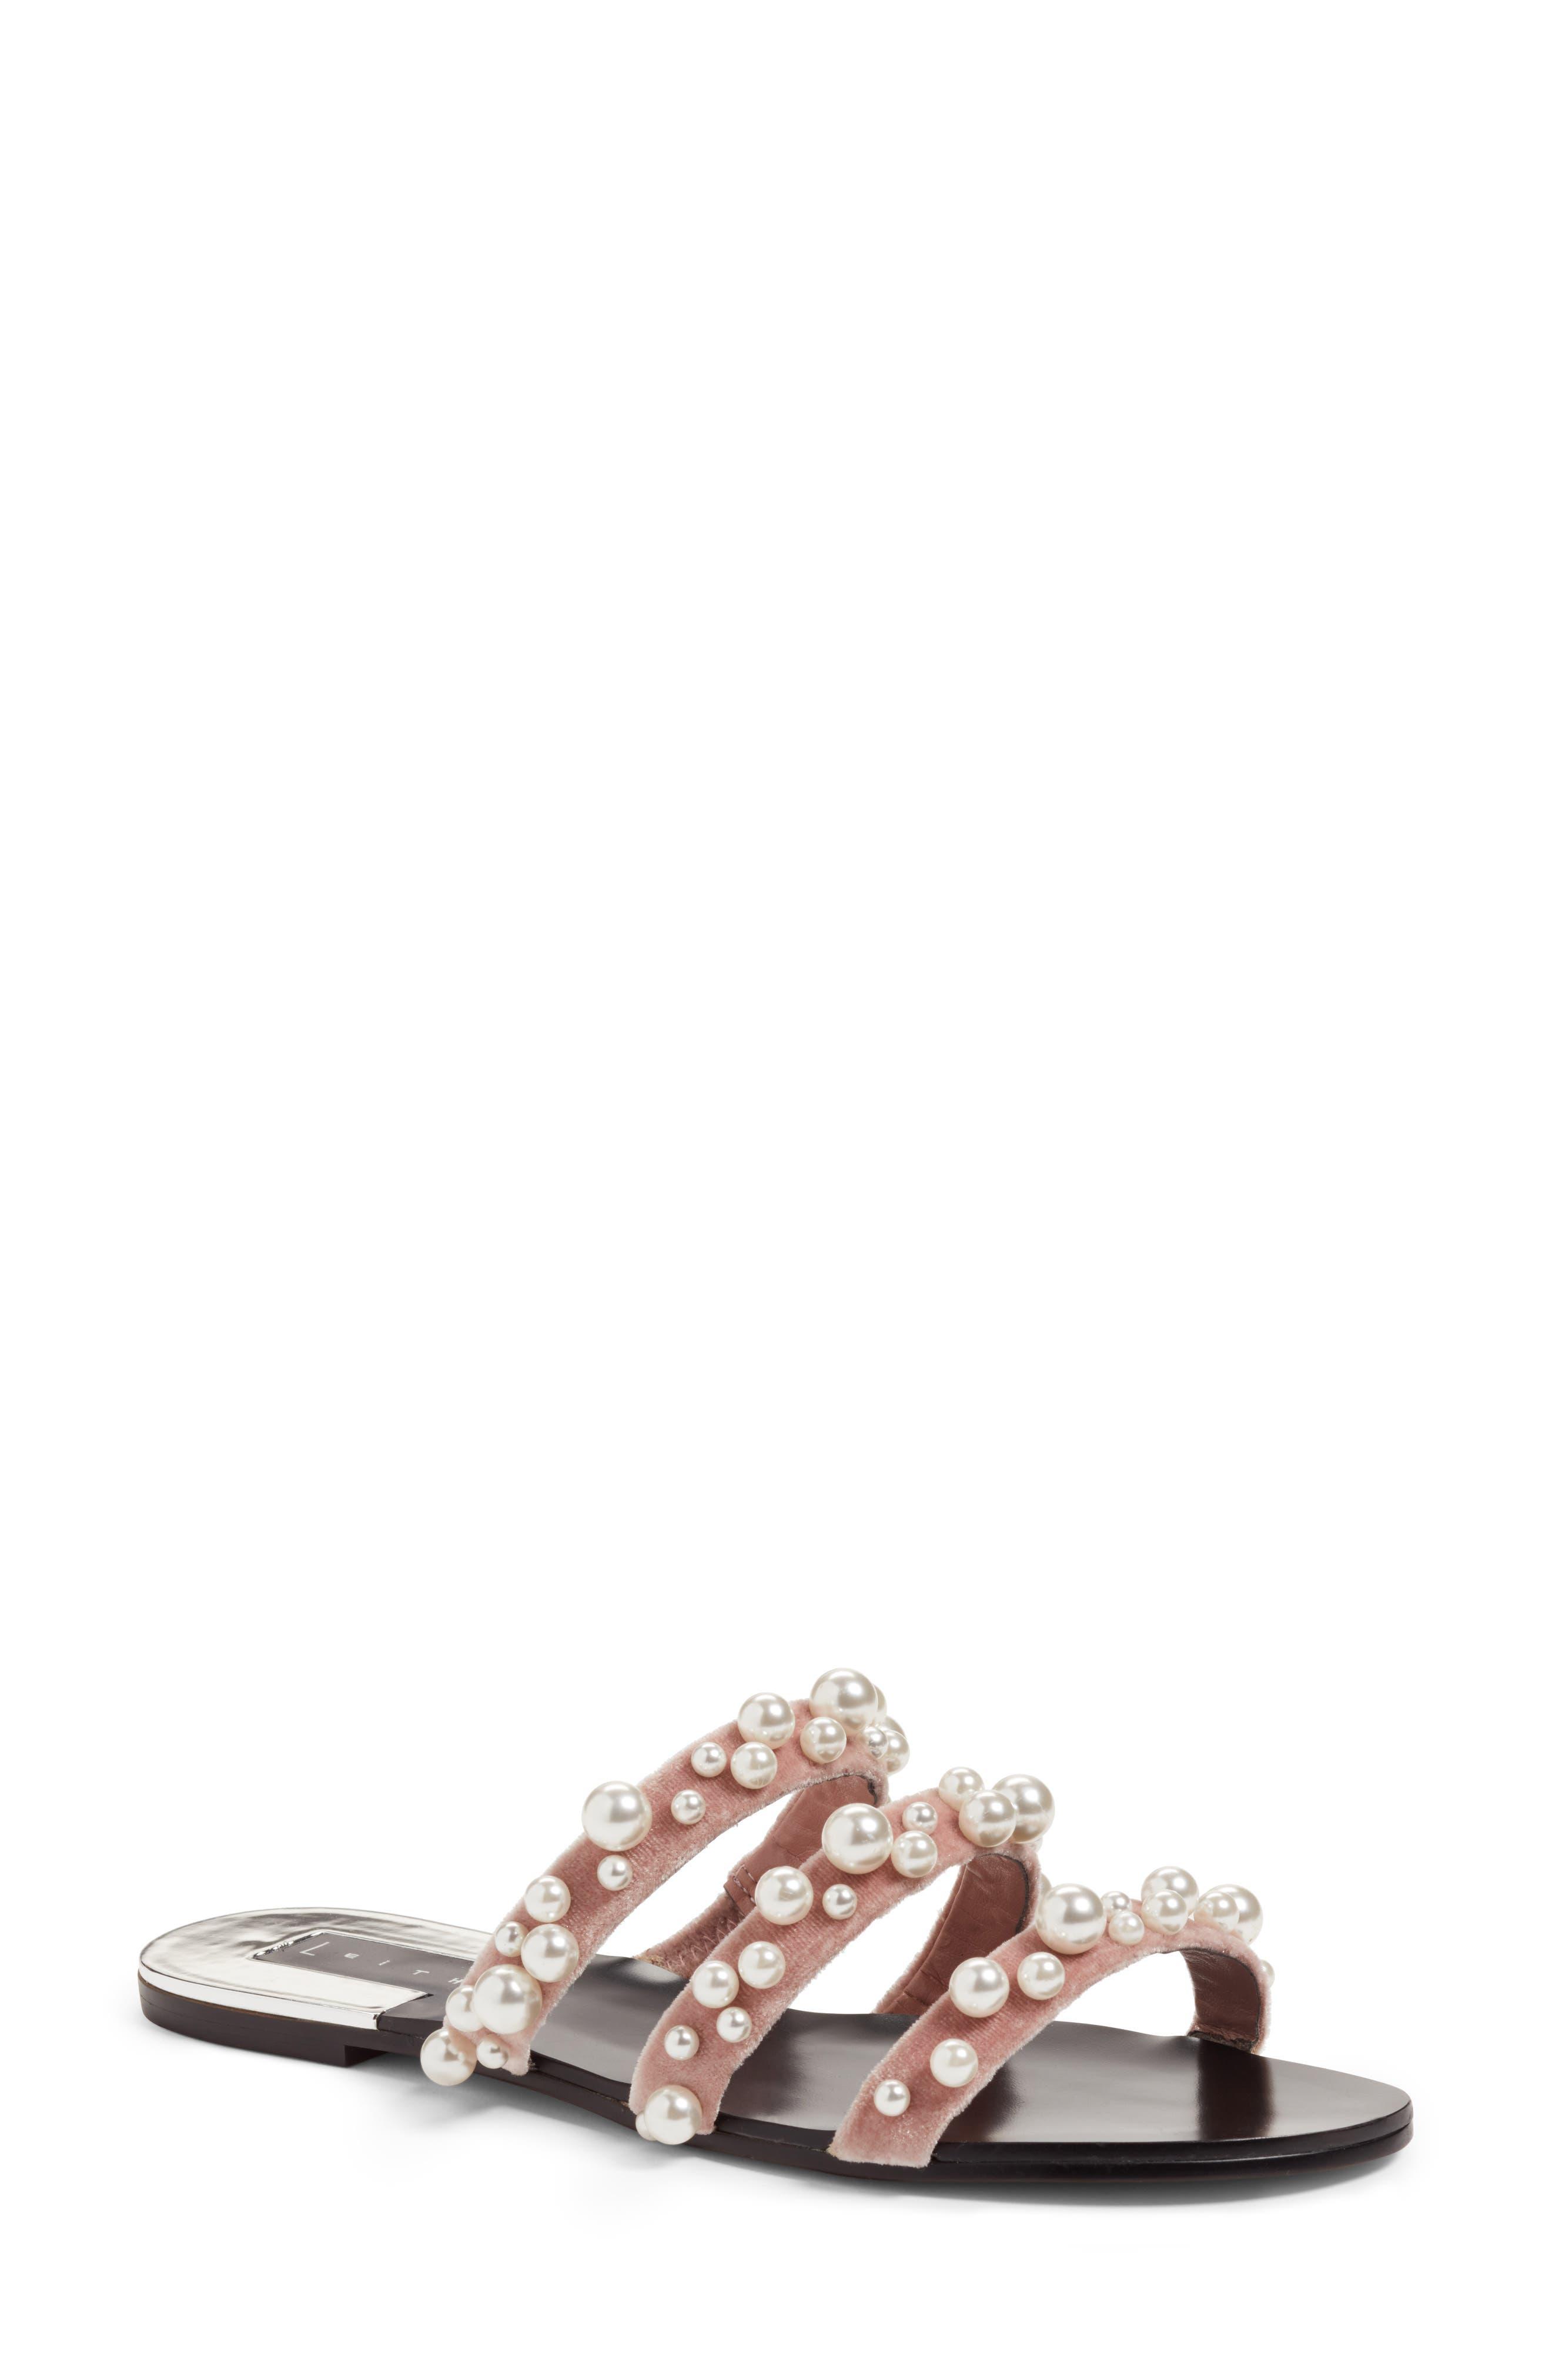 LEITH Stunner Embellished Strappy Slide Sandal, Main, color, BLUSH VELVET